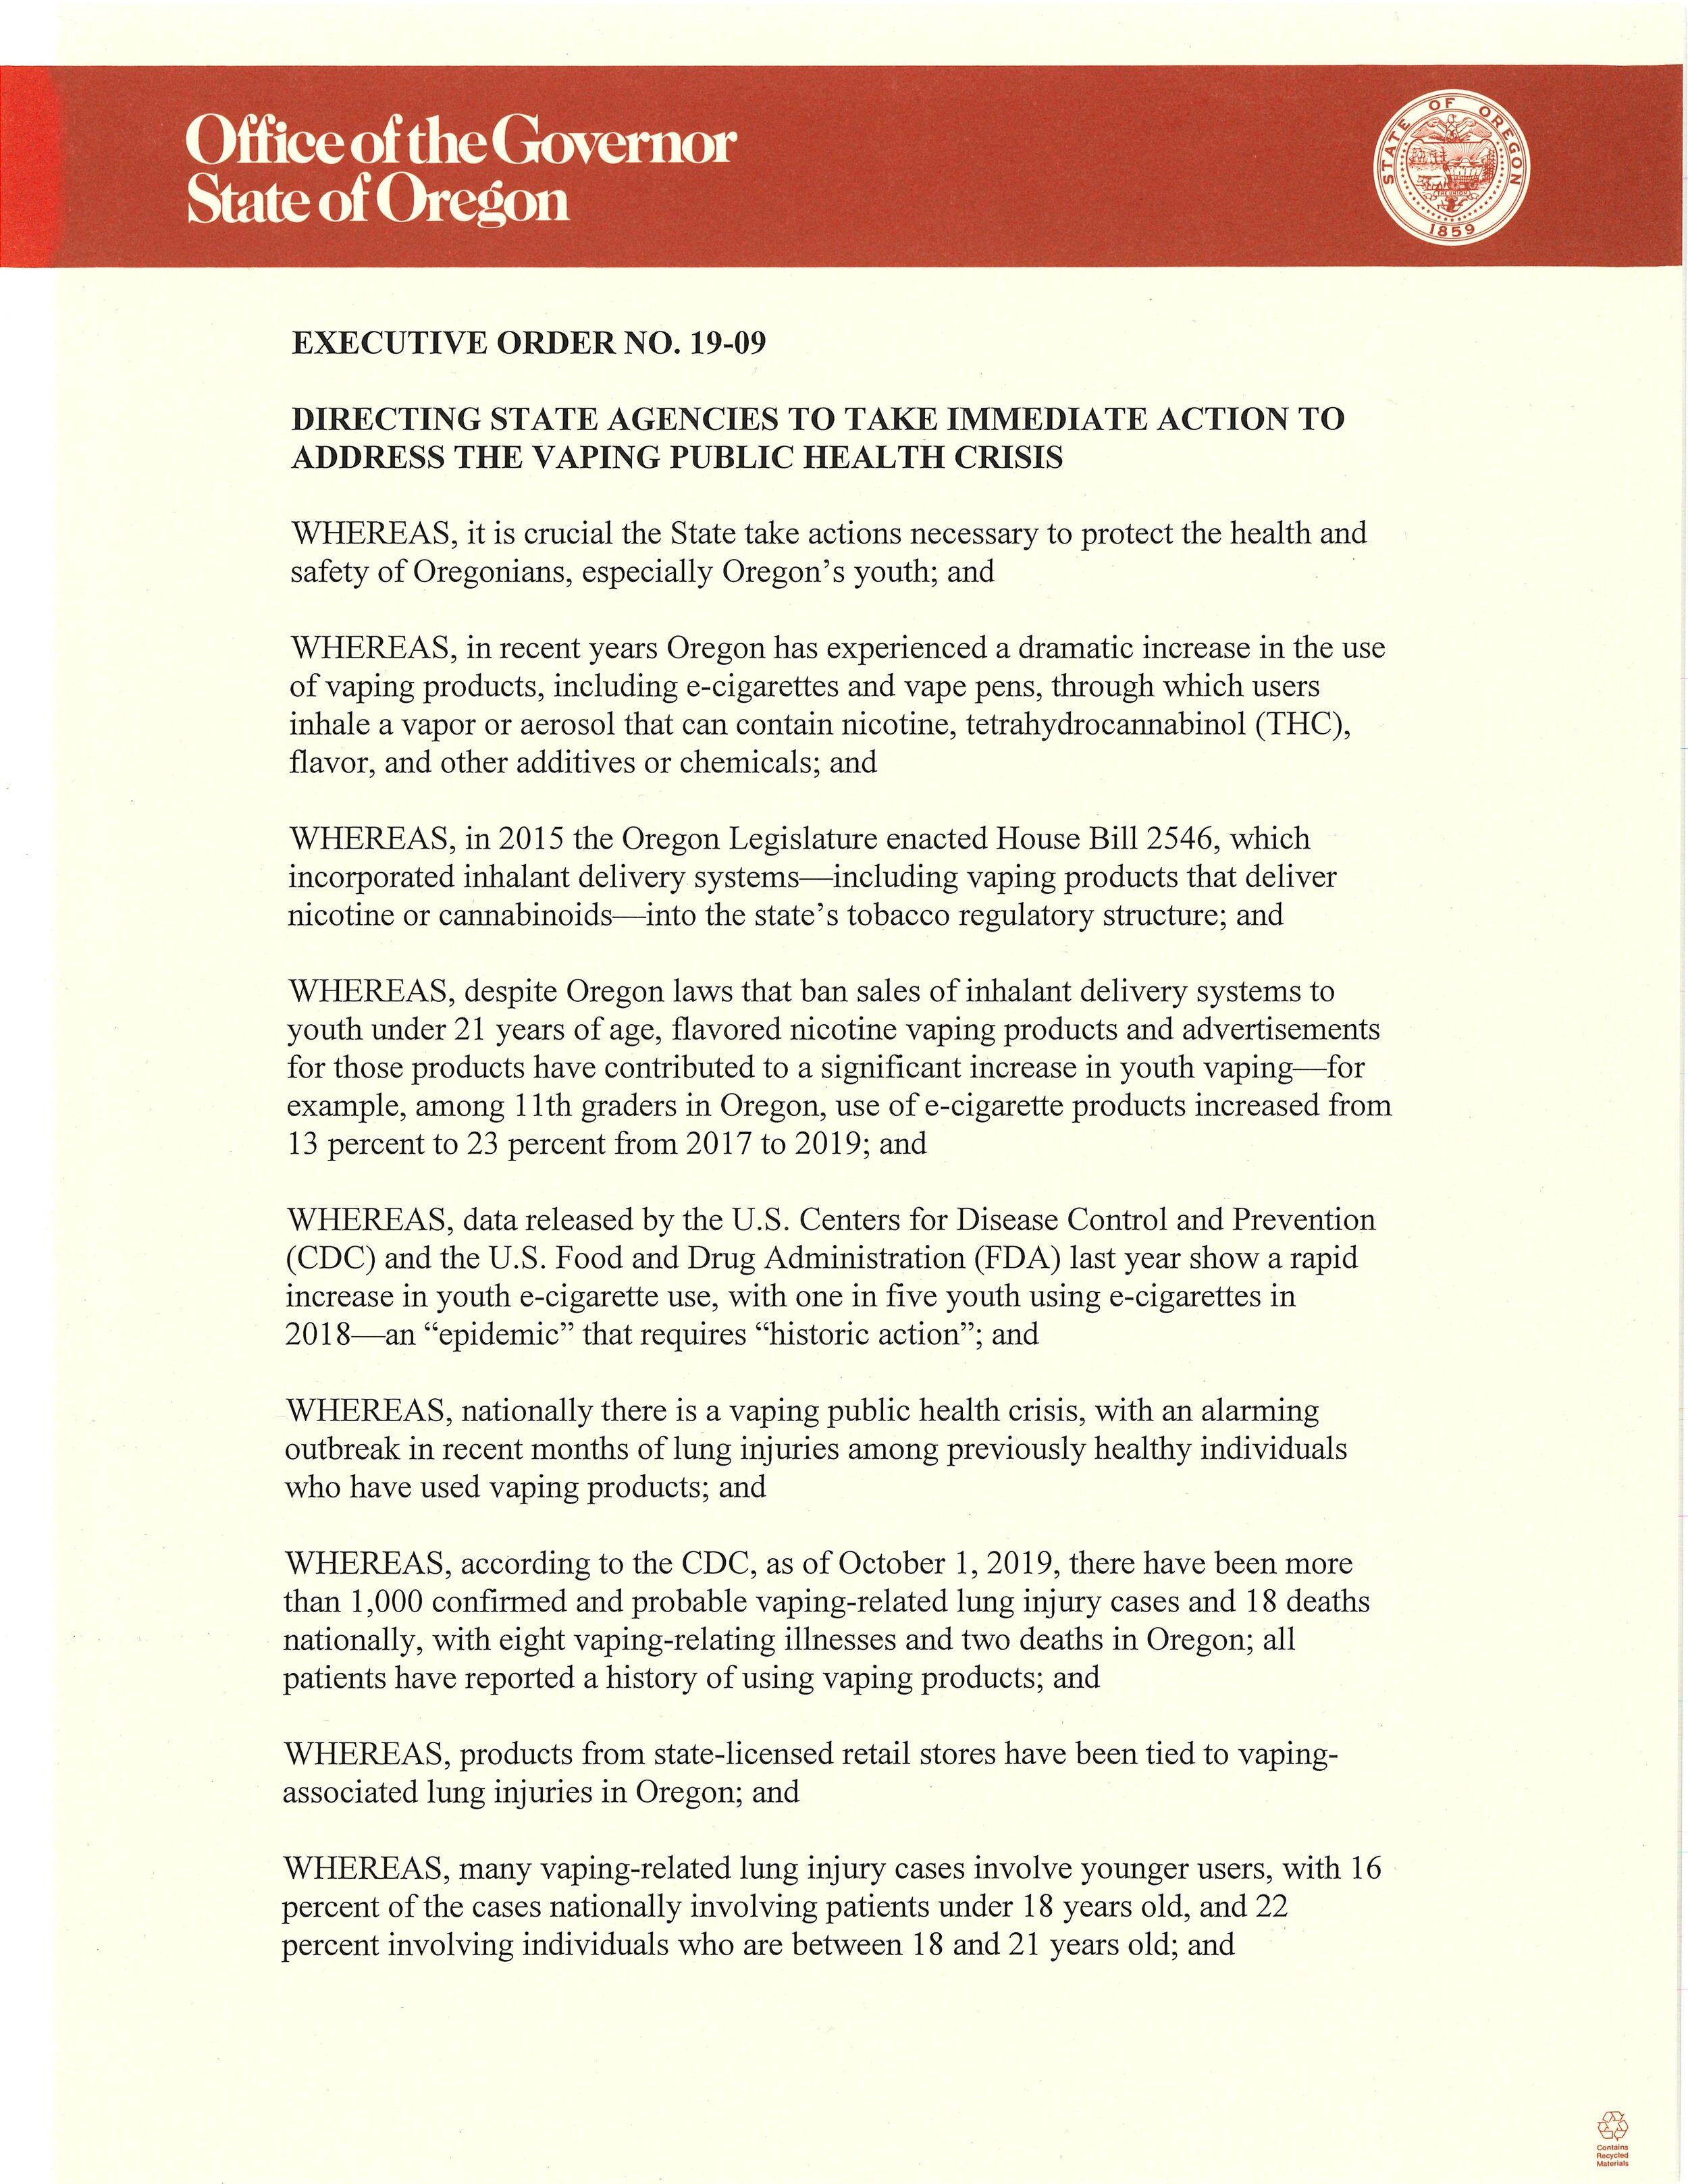 Executive order 19-09. Click for PDF